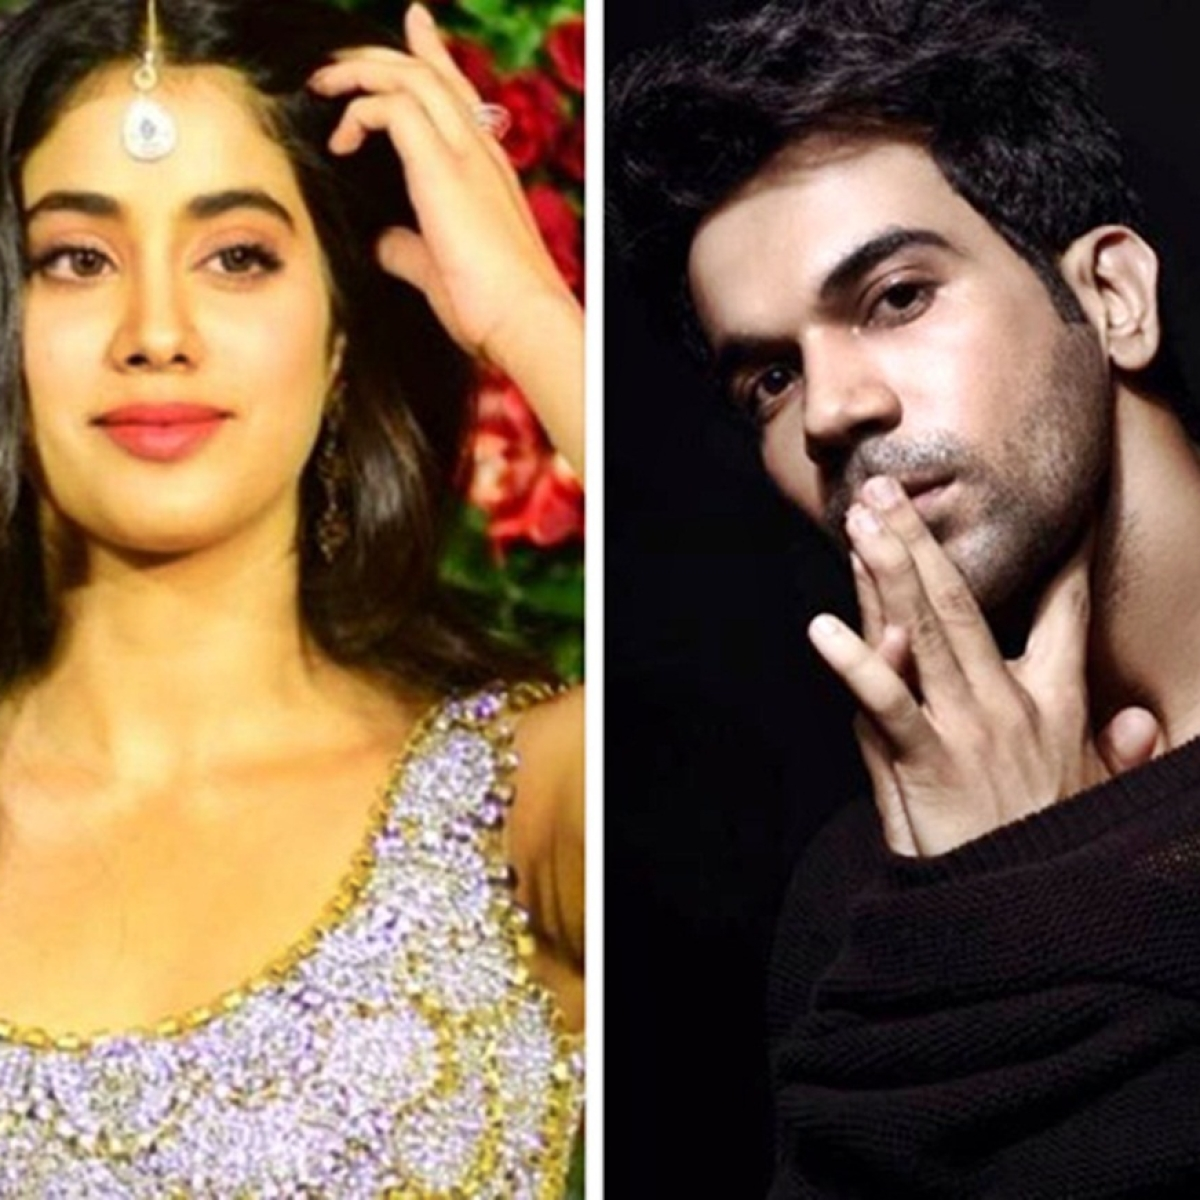 John Abraham to join 'Dostana 2' with Rajkummar Rao, Janhvi Kapoor to play female lead